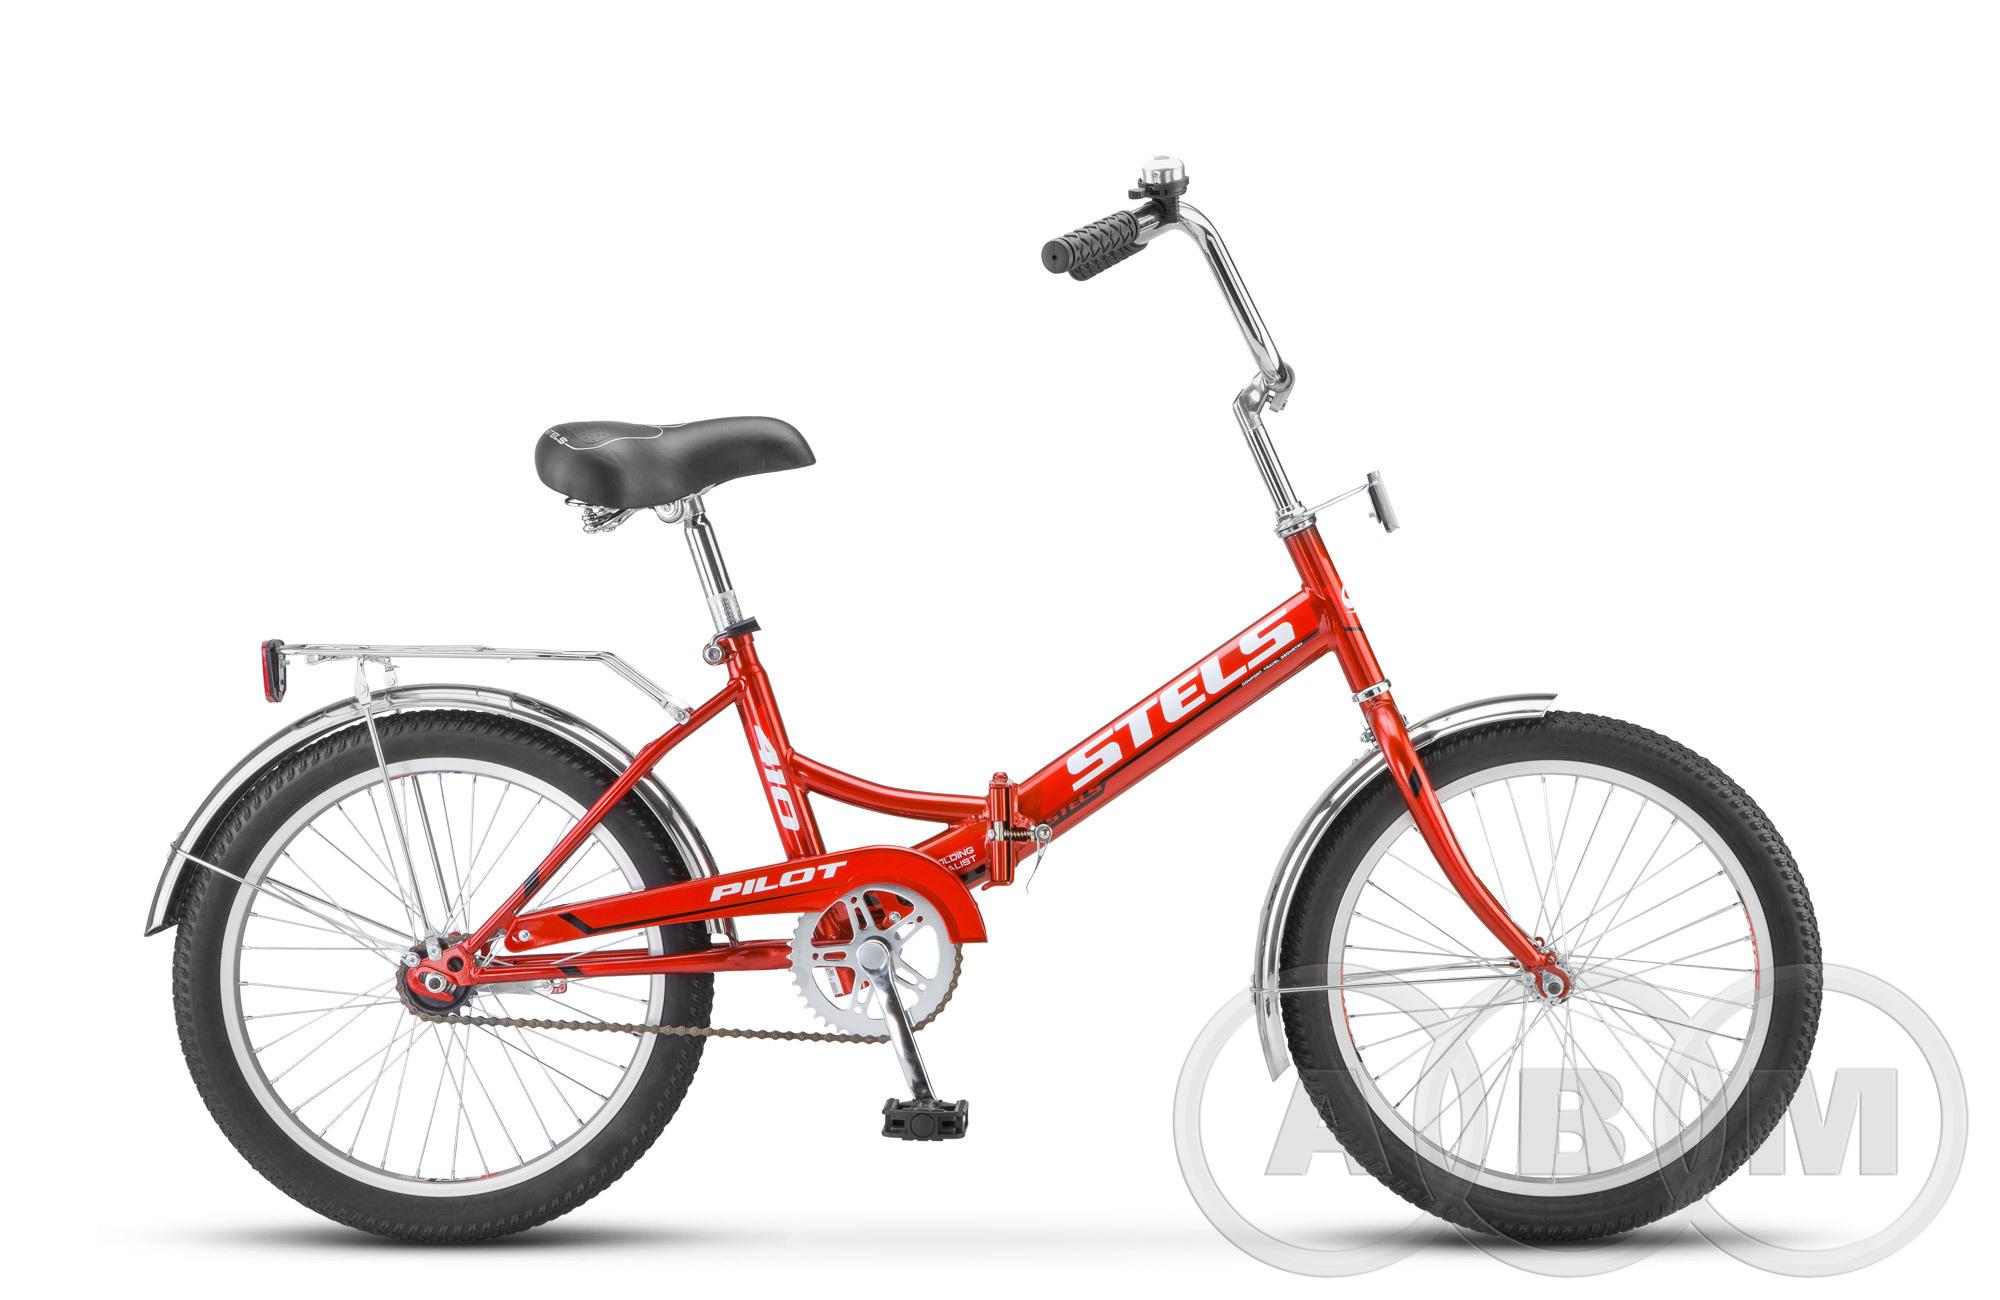 20 Велосипед Stels Pilot-410  1 ск.